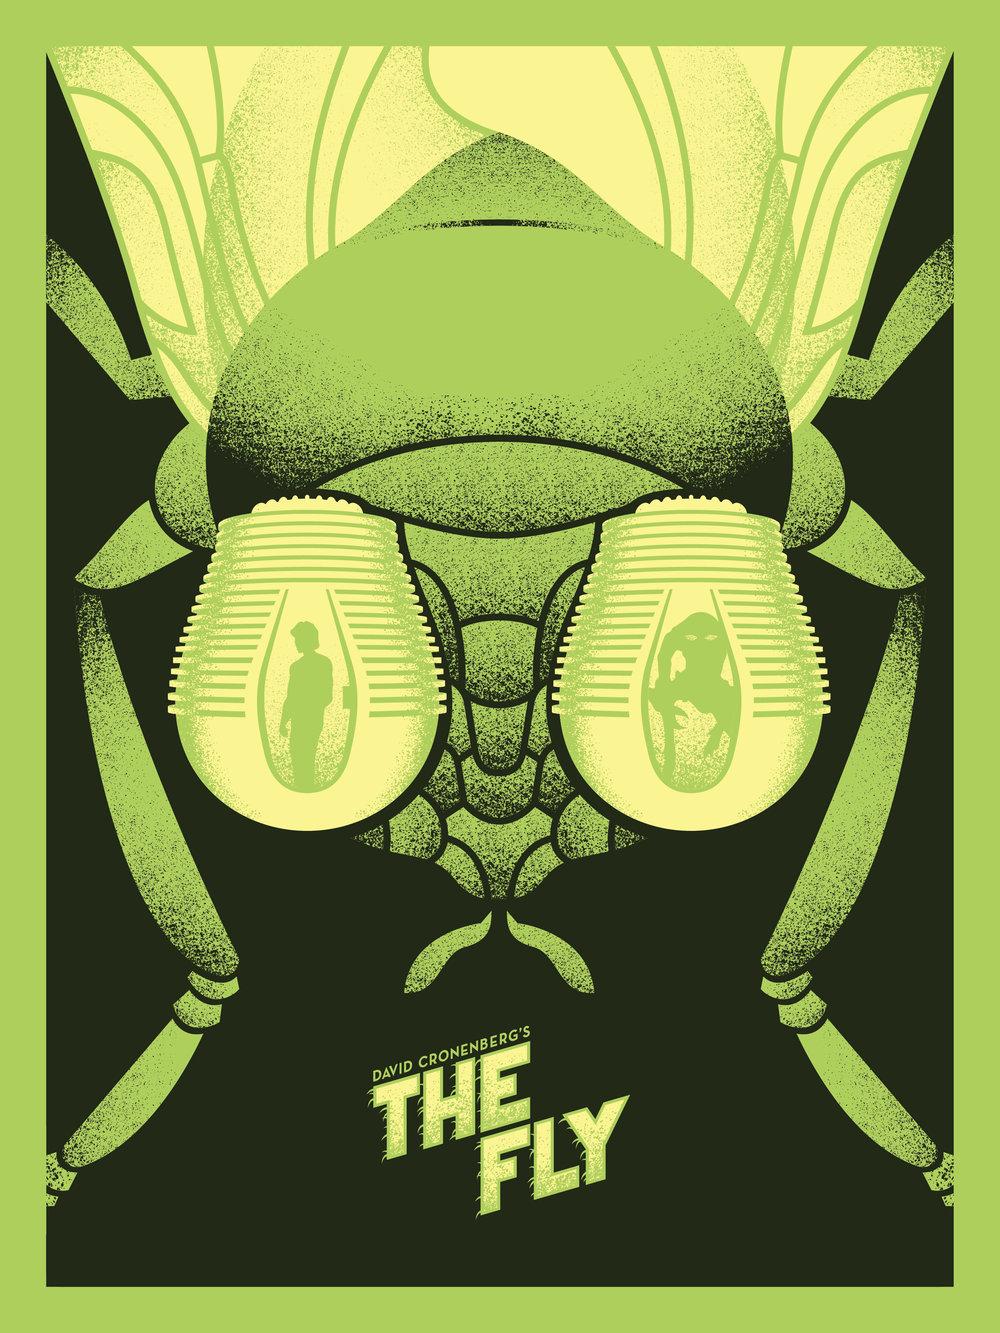 the_fly_brinkerhoff.jpg